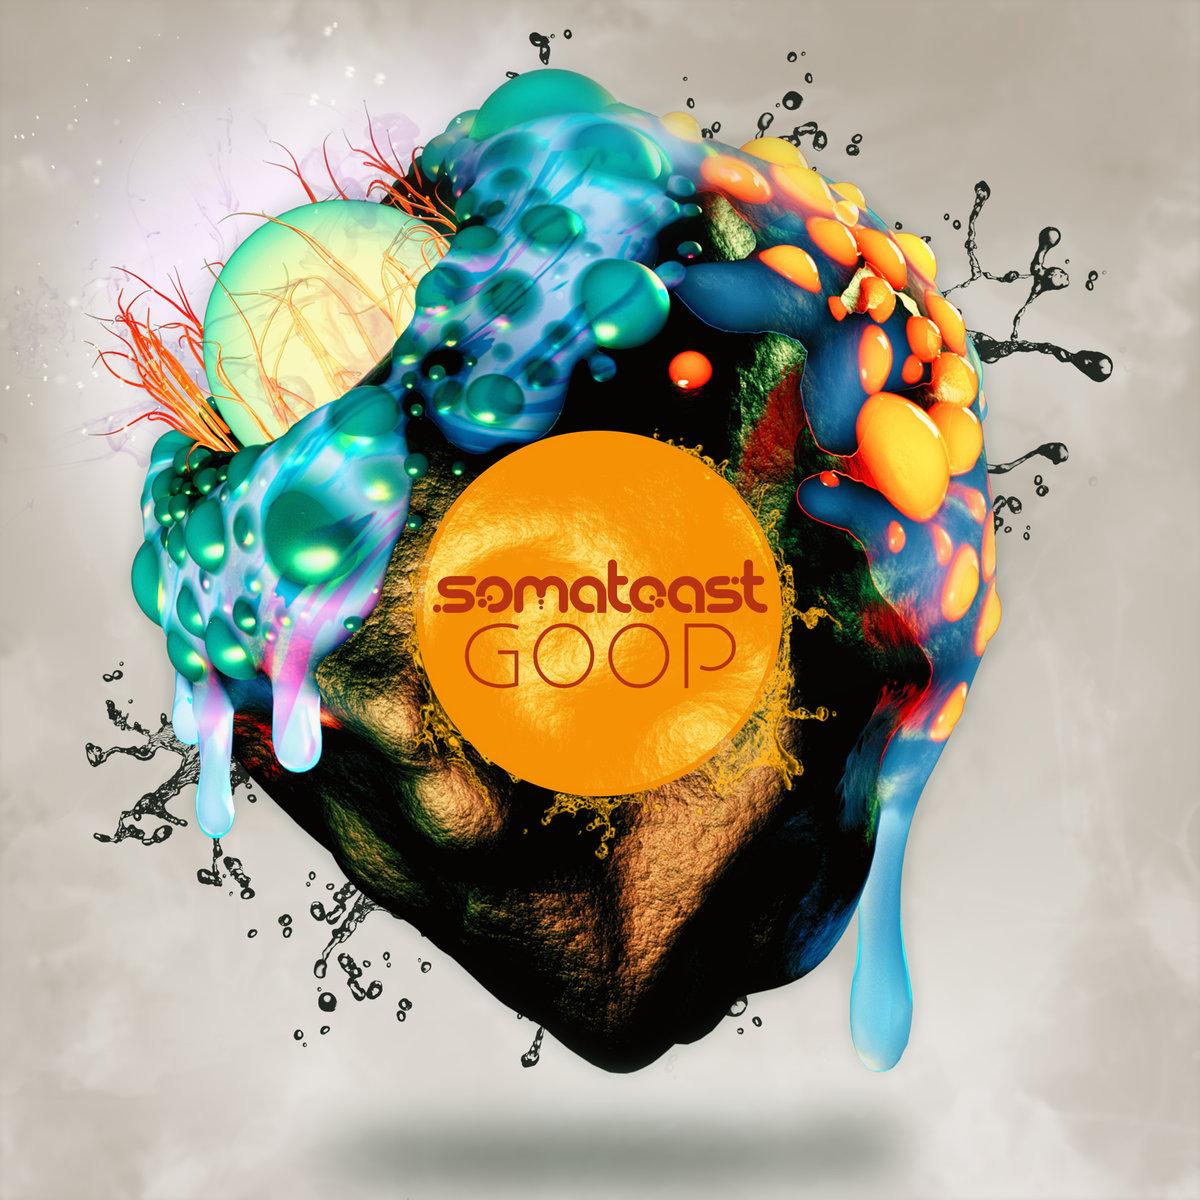 25. Somatoast - Goop